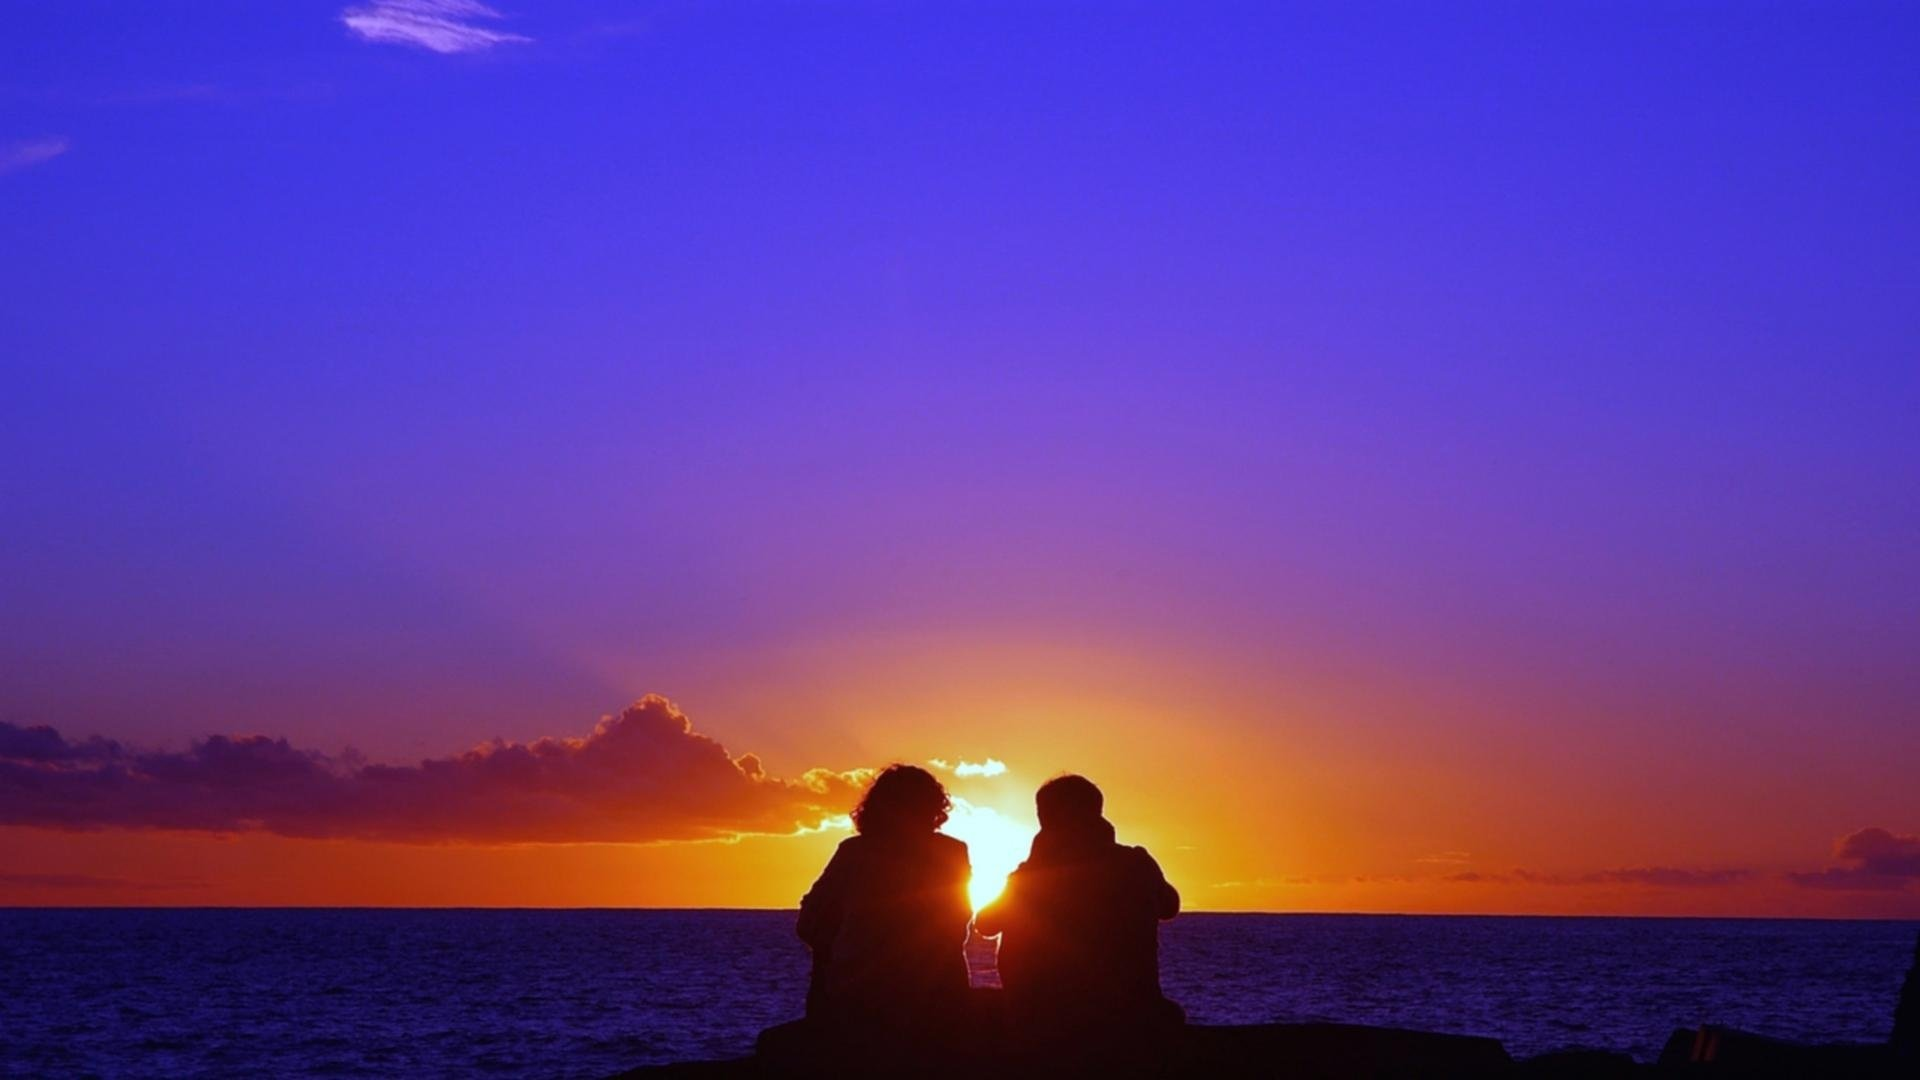 Romantic couple boy girl silhouette sunset the evening sun